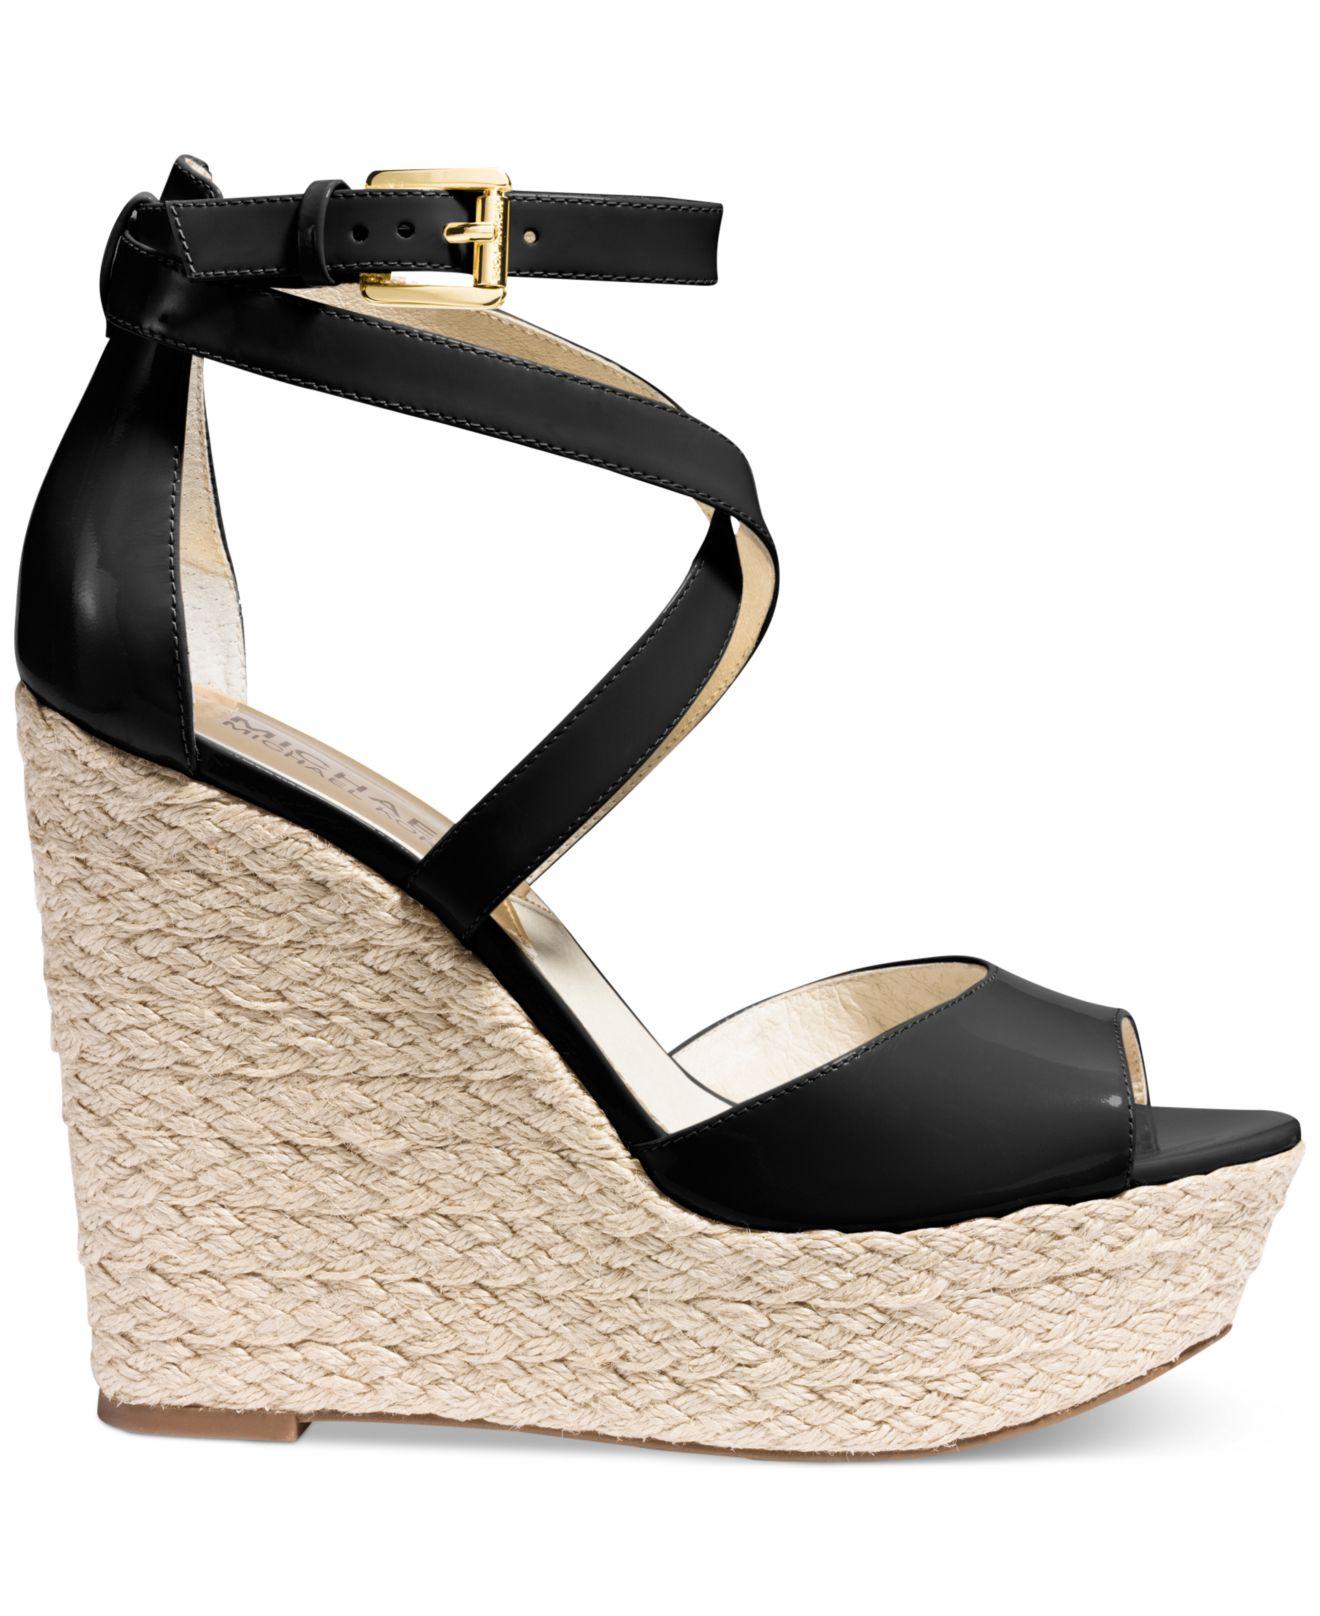 Black Patent Platform Wedge Shoes